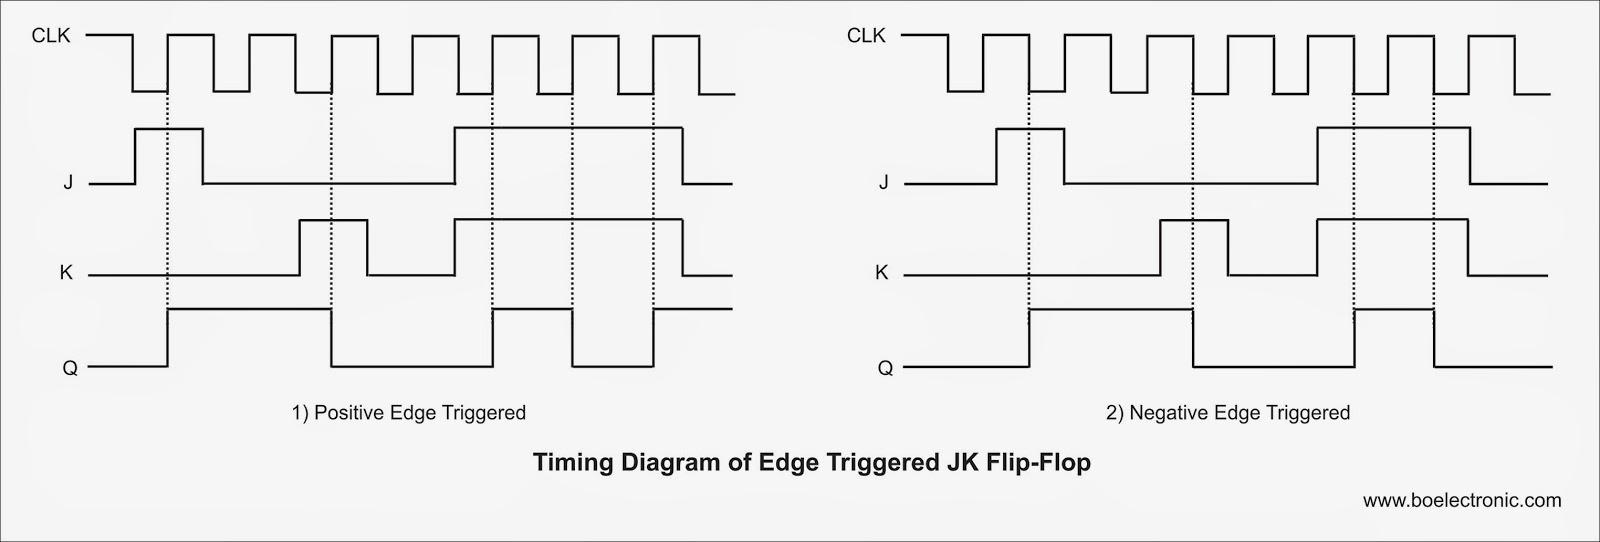 small resolution of positive edge triggered d flip flop timing diagram d type flip flop elsavadorla negative edge triggered